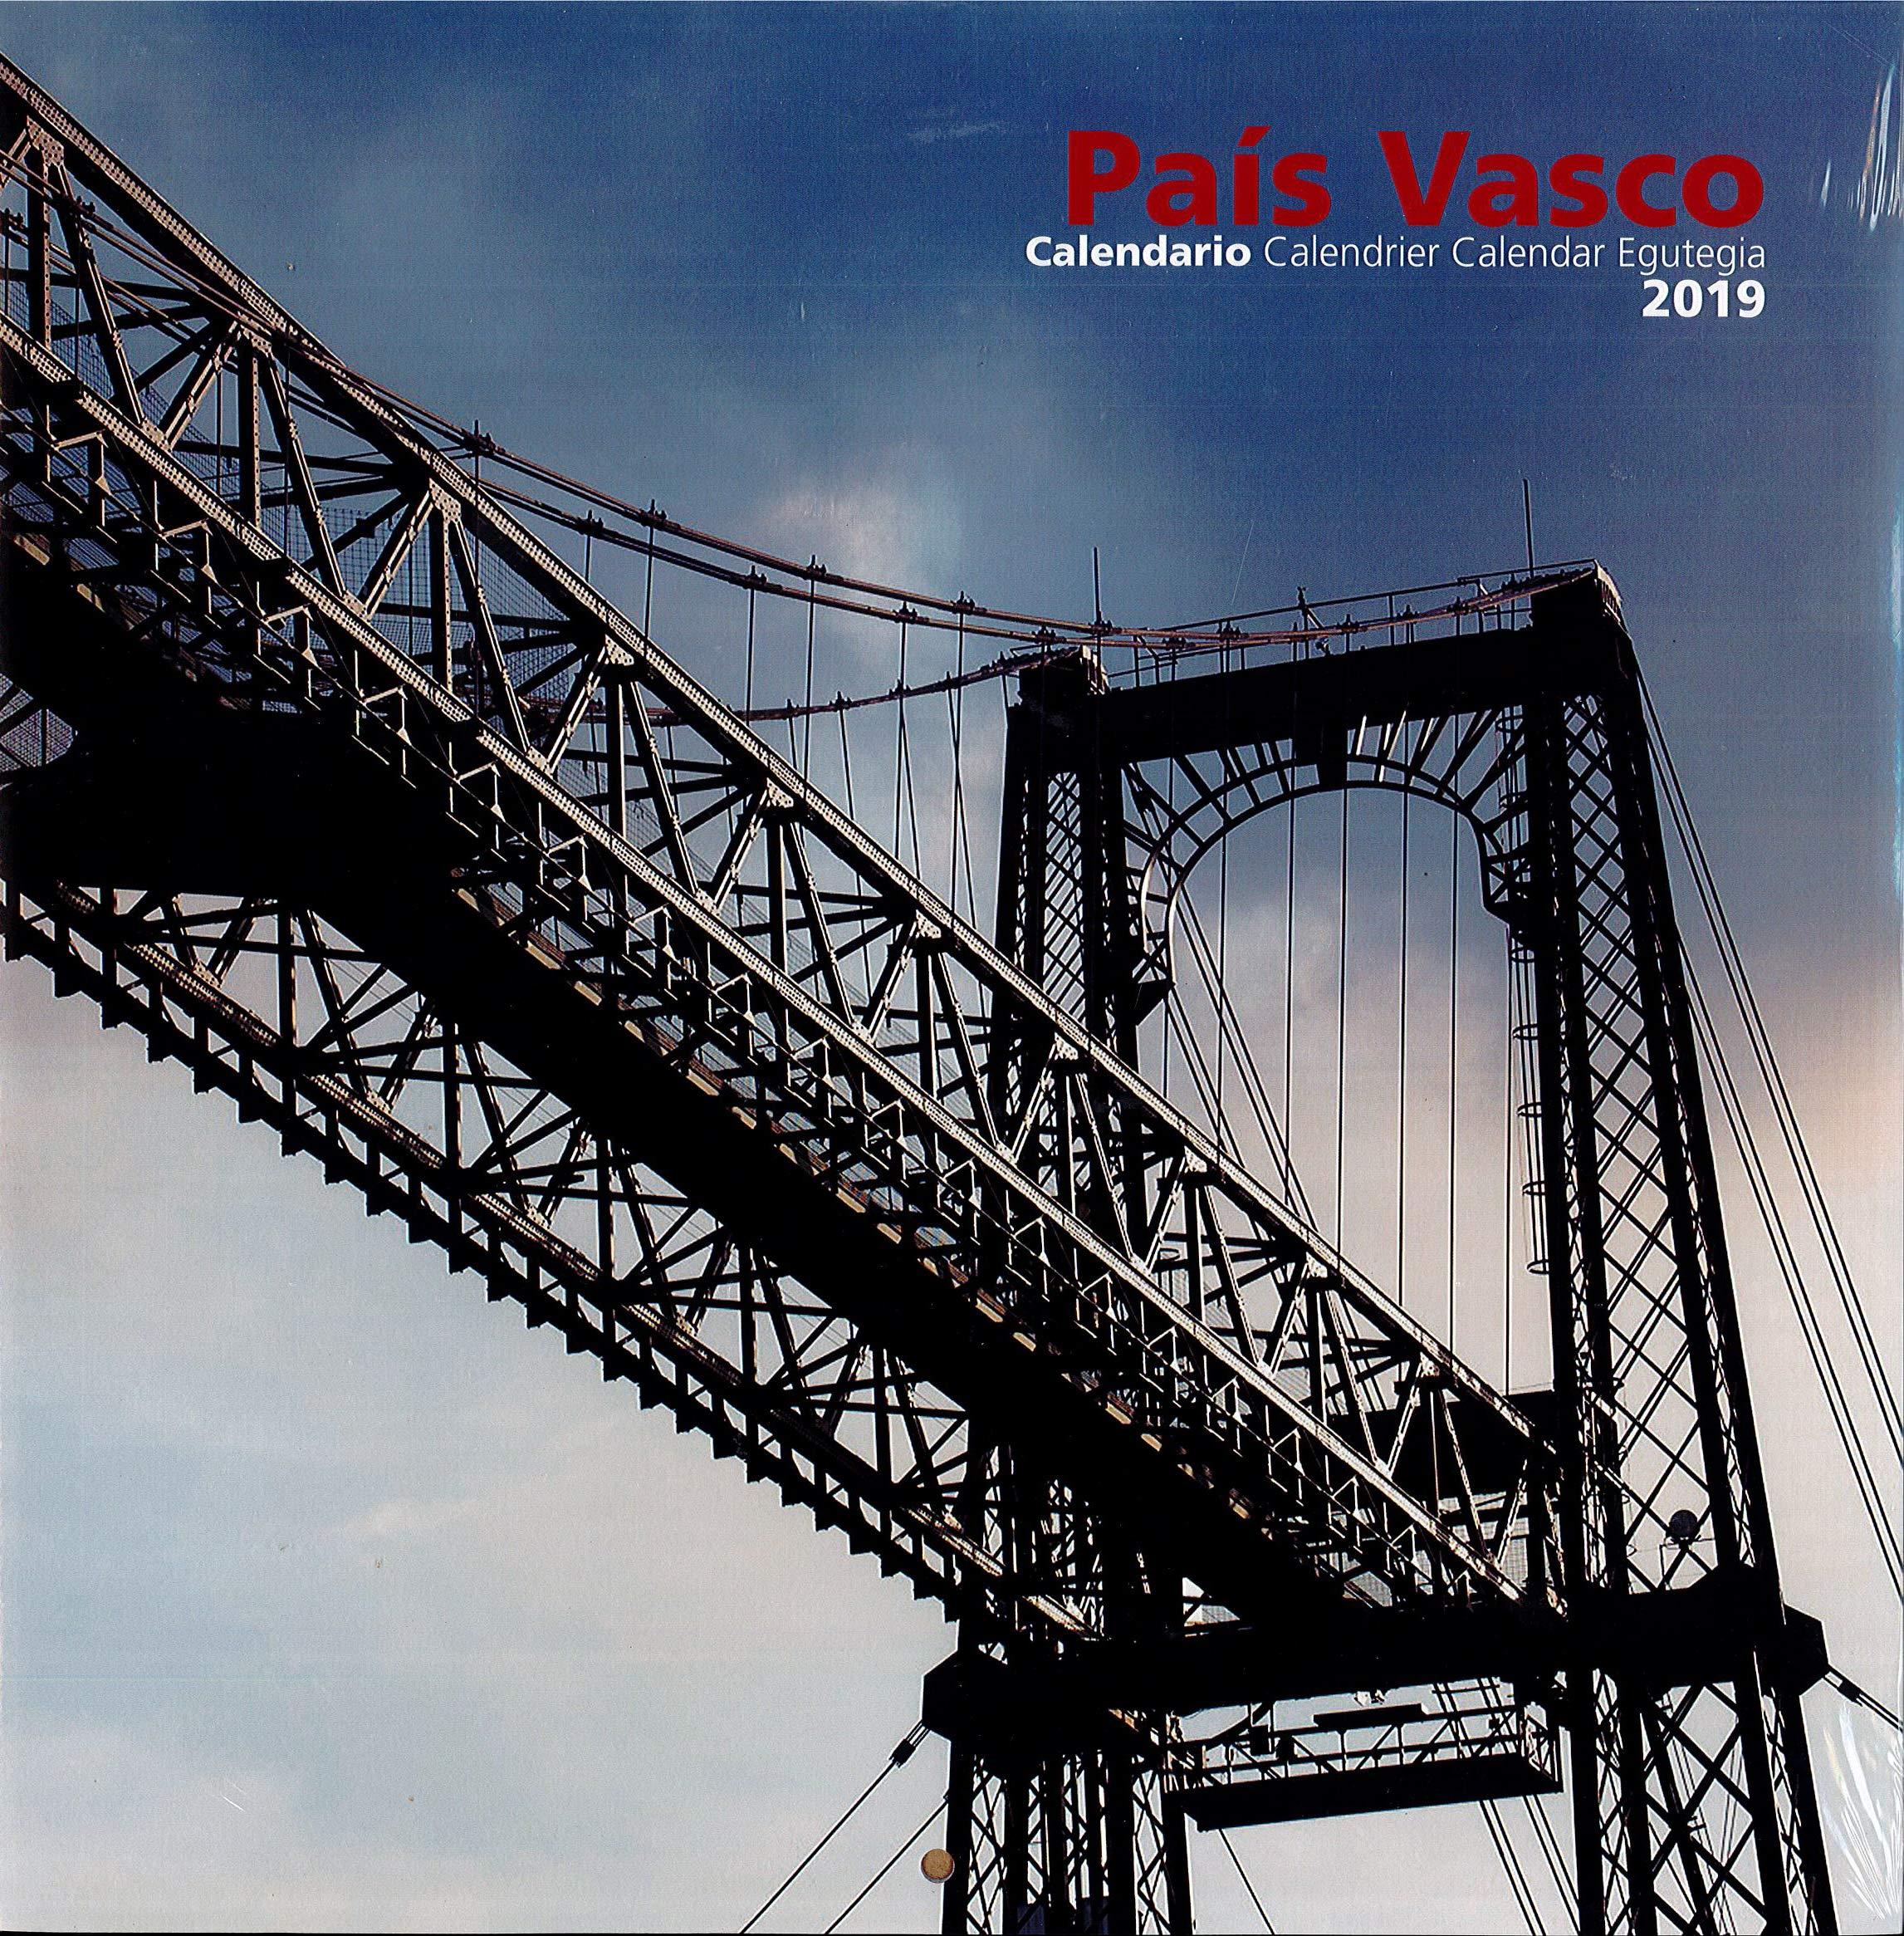 Calendario Pais Vasco 2019 pared Tapa blanda – 11 sep 2018 Ediciones Mensajero 8427141521 GBCY EDUCATION / General